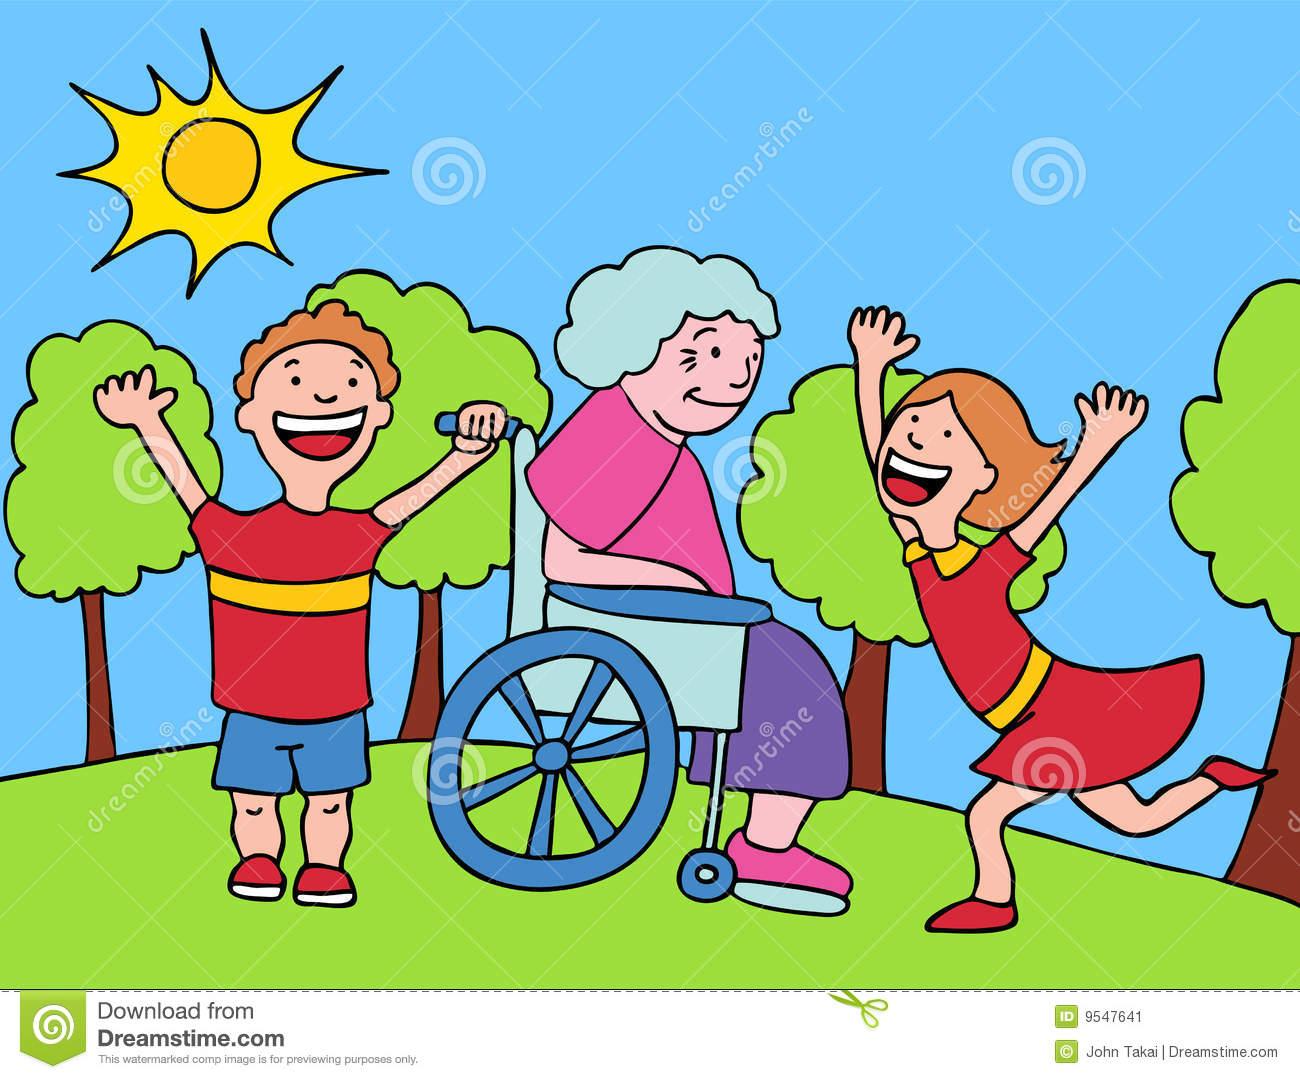 Clipart kid visiting grandma png Visit with Grandma | Clipart Panda - Free Clipart Images png